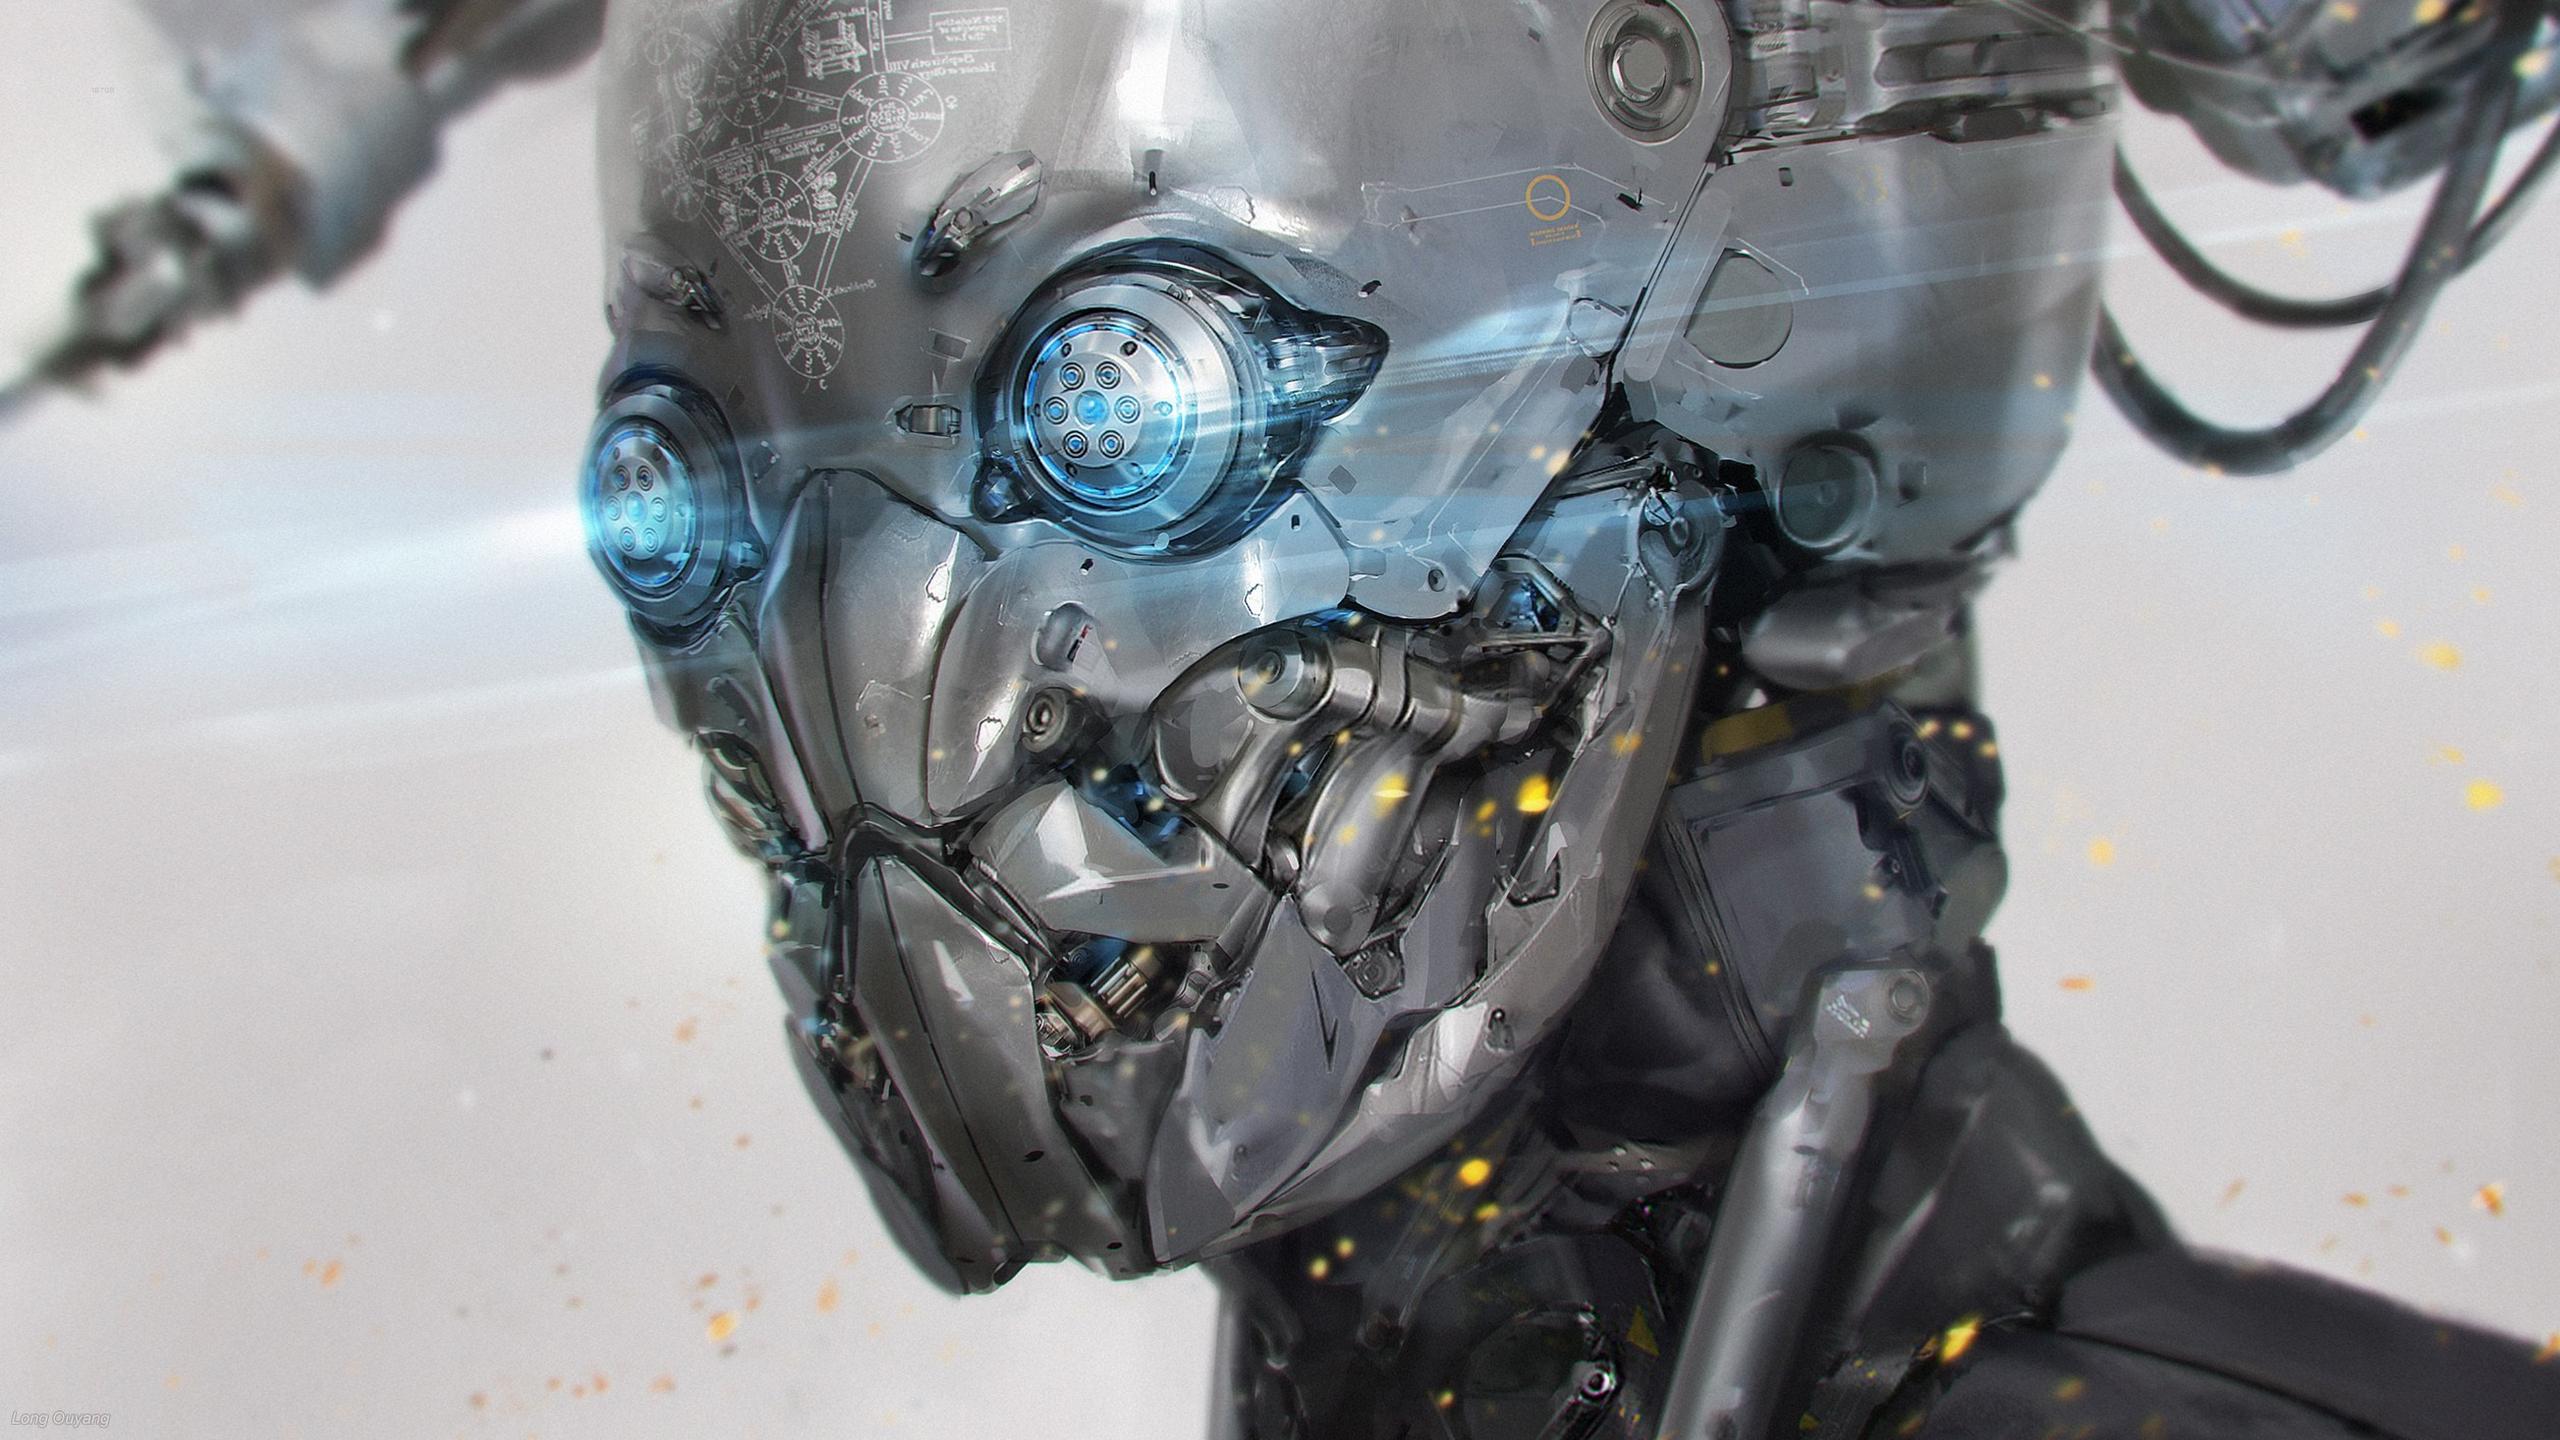 Sci Fi Wallpaper 2560x1440: Robot Computer Wallpapers, Desktop Backgrounds